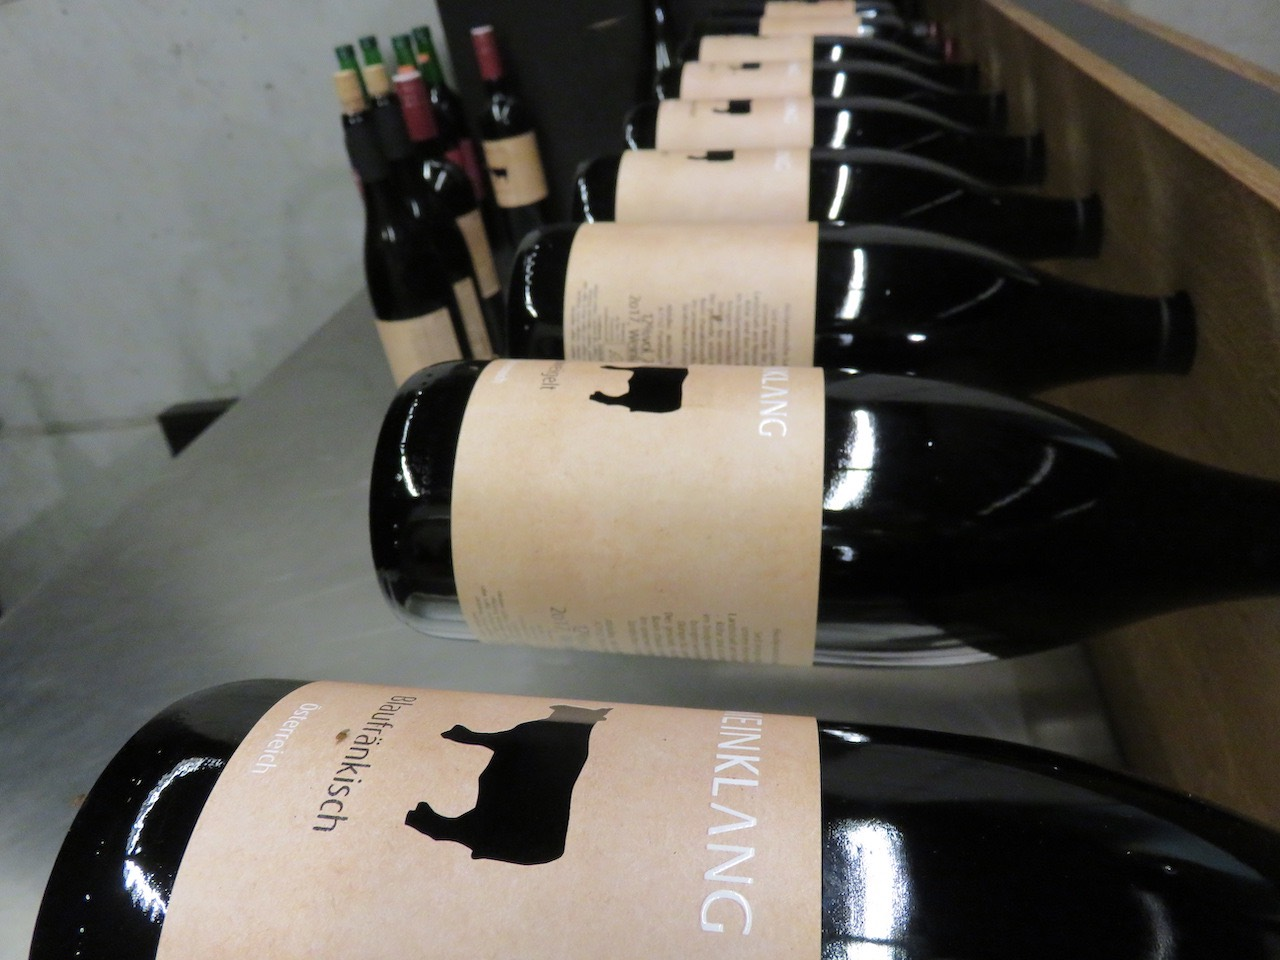 Meinklang, Bio-diverse wines